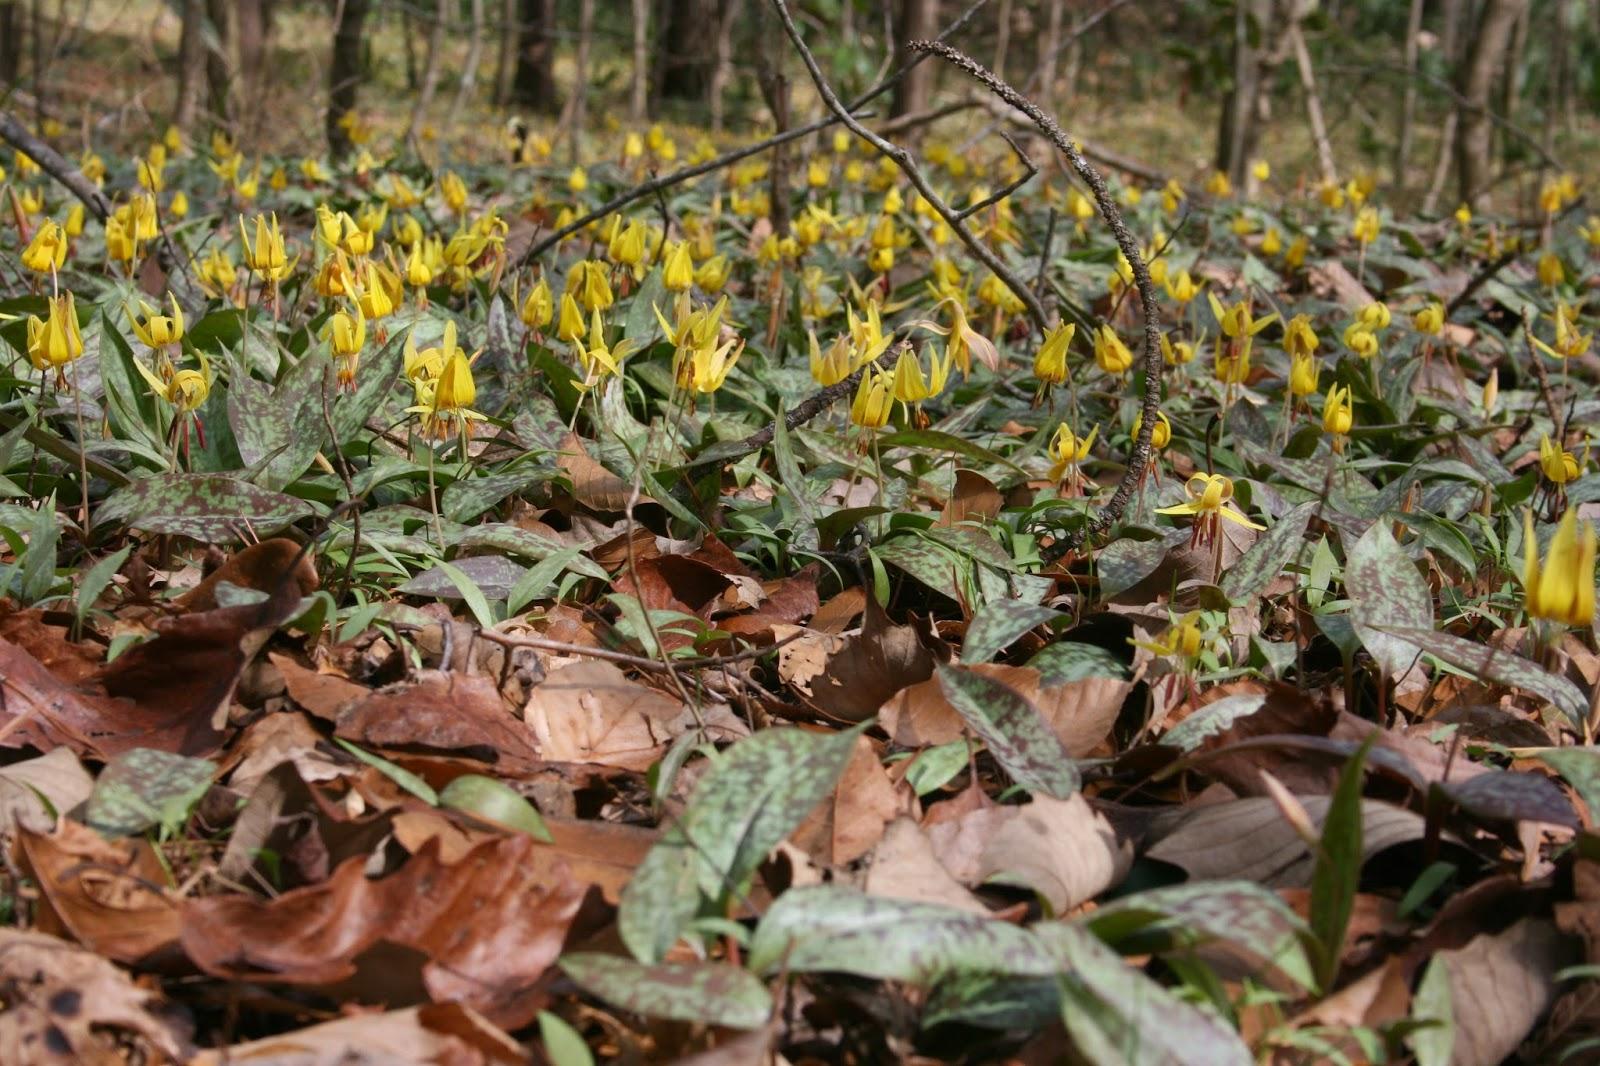 Native Florida Wildflowers February 2014